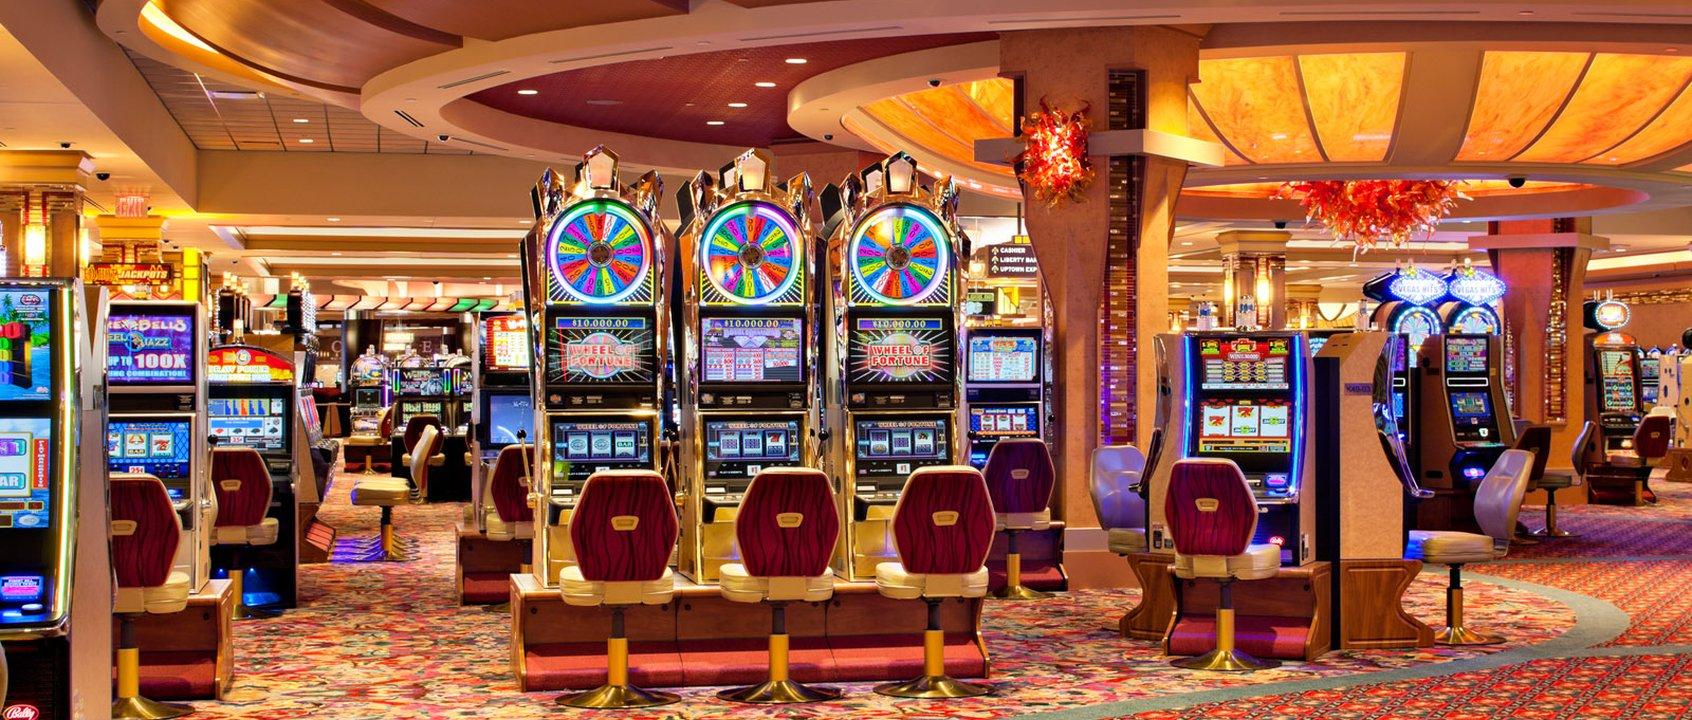 Manhattan+casino+resorts el+dorado+casino+shreveport